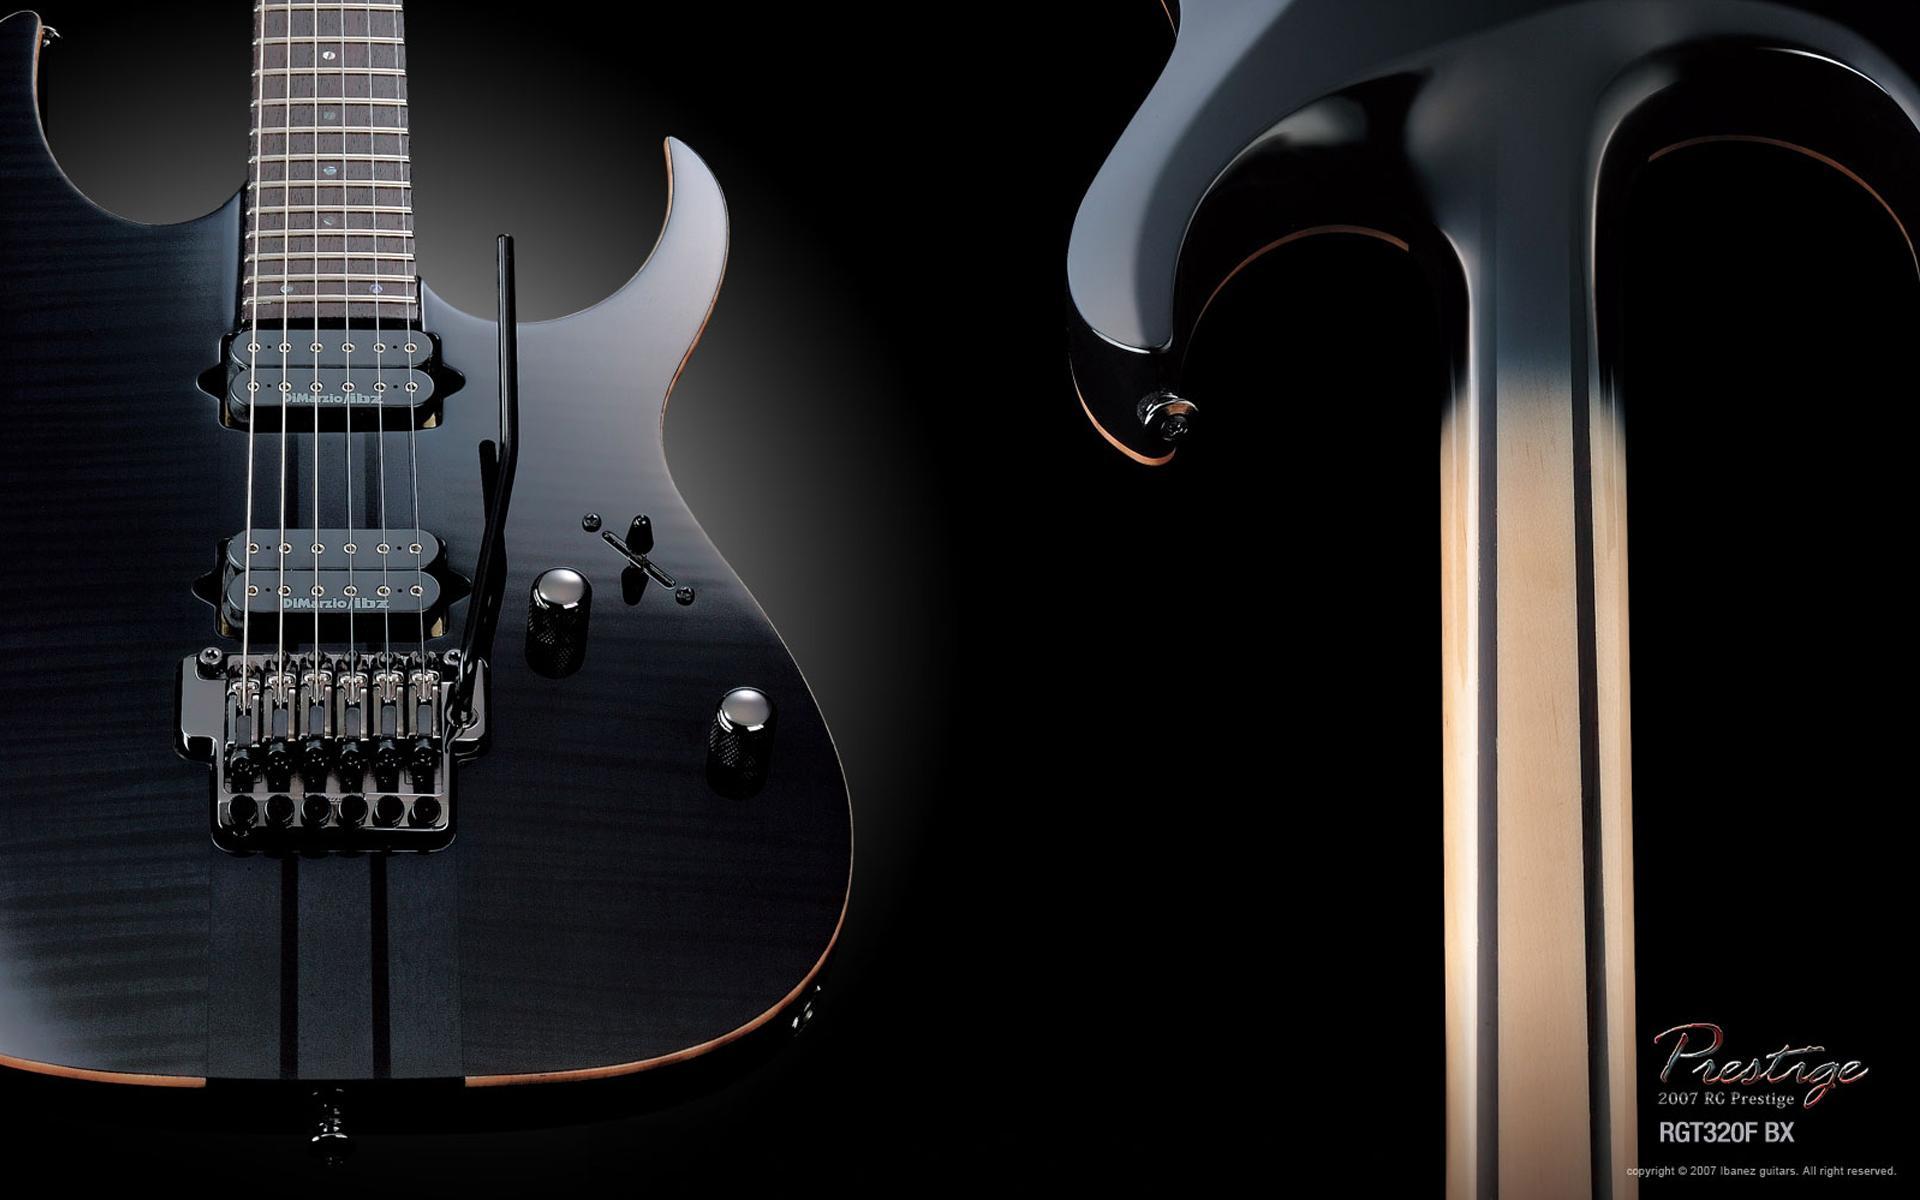 Guitar Ibanez Wallpaper 13366 Hd Wallpapers in Music   Imagescicom 1920x1200